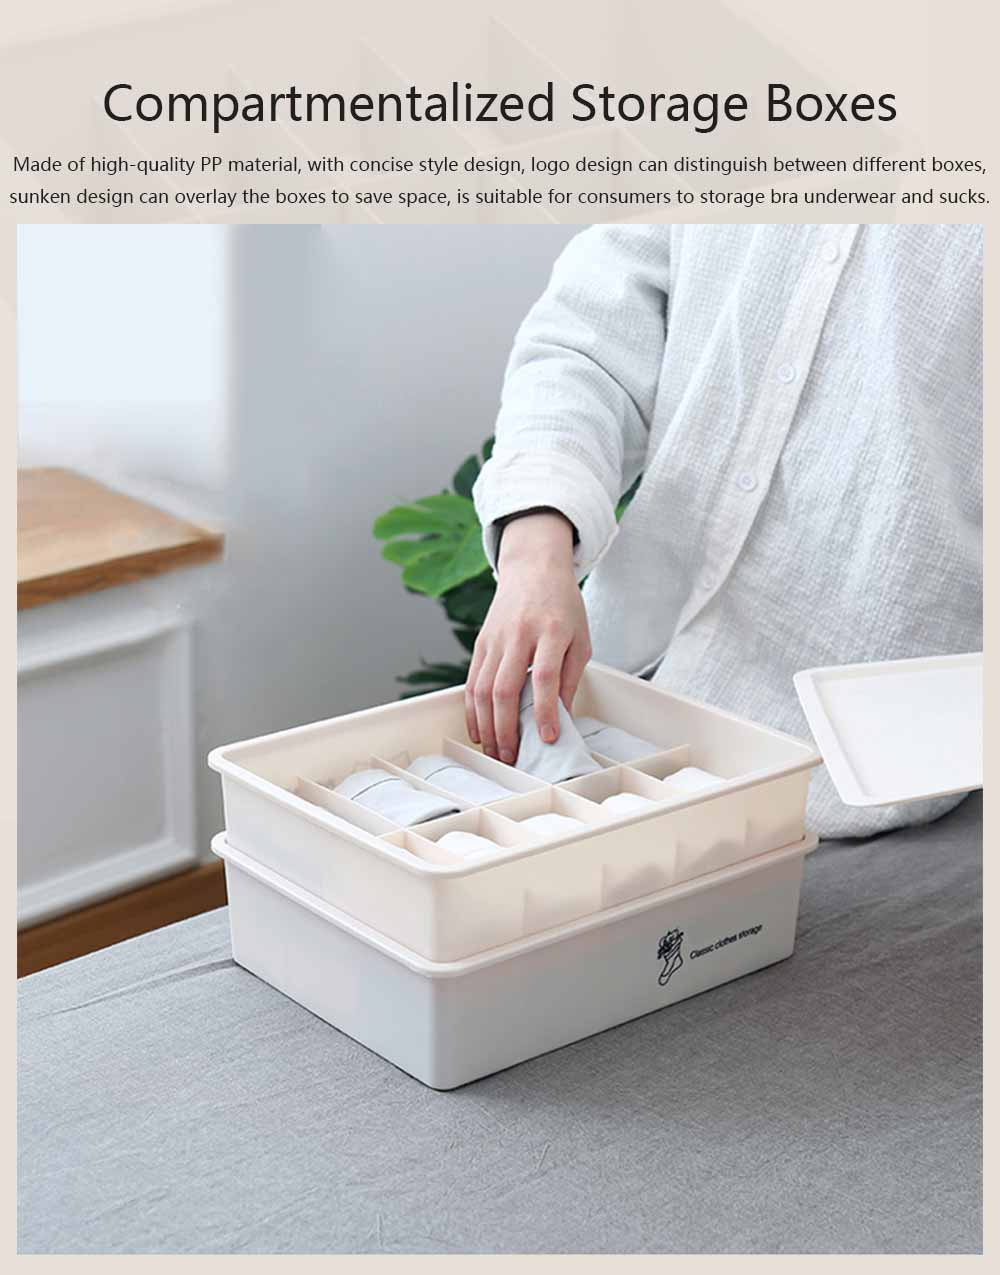 Compartmentalized Storage Boxes Higher Bottom Sunken Design Concise Style Underwear Bra and Socks Storage Cases 0